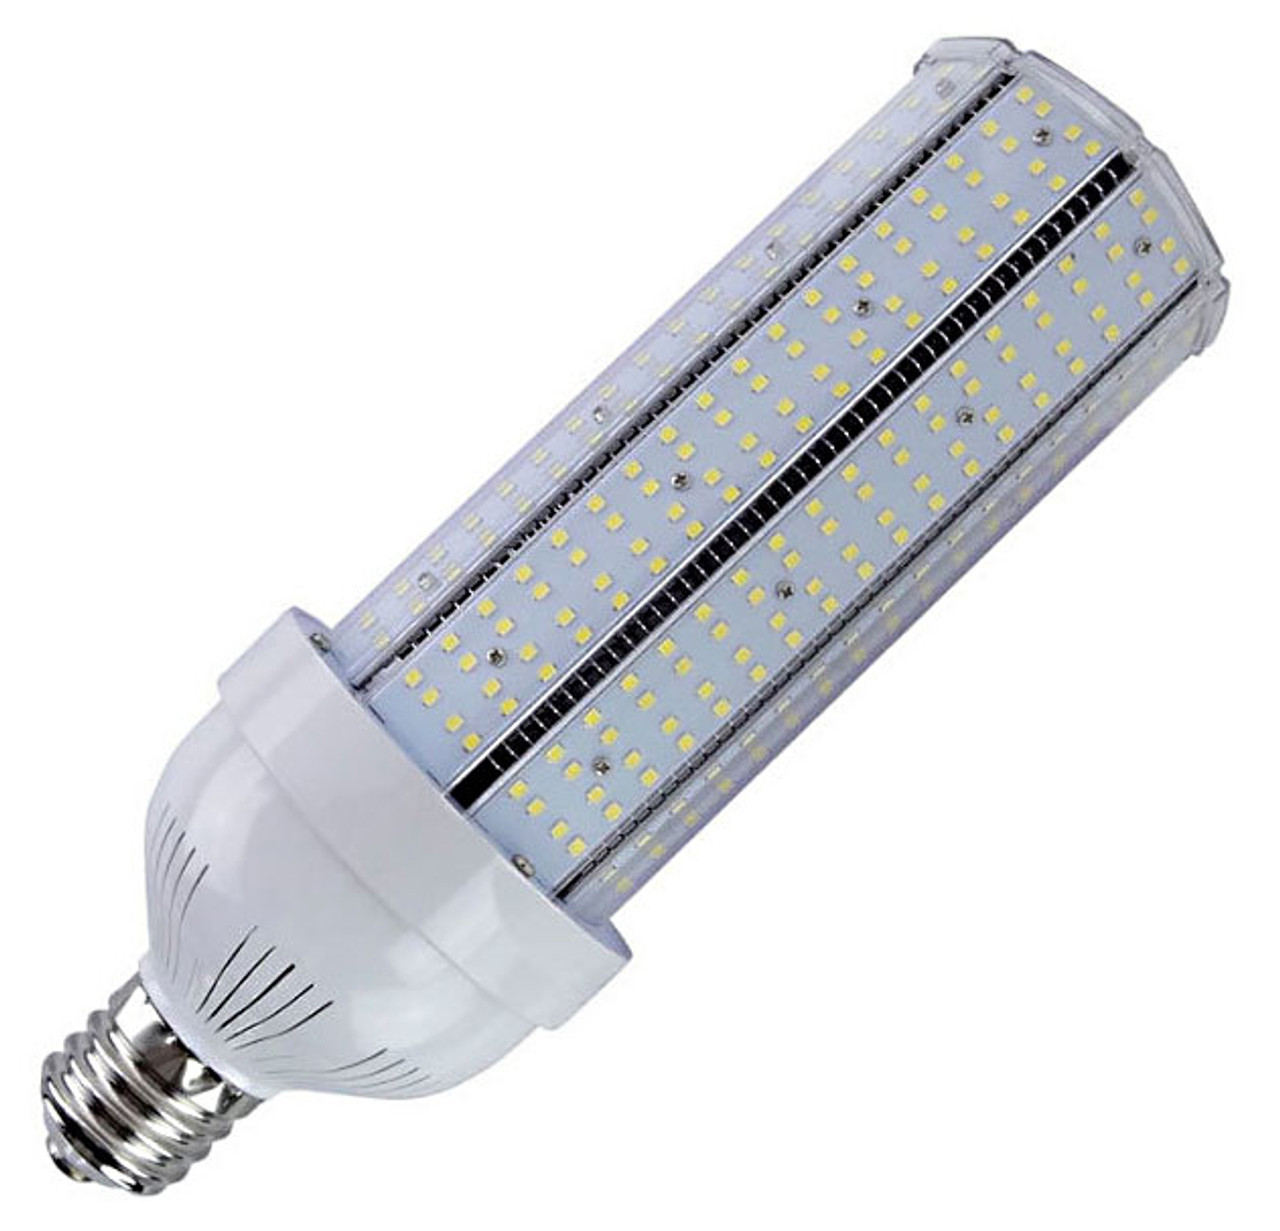 400-450 Watt LED HID Retrofit Corn Bulb Replace Halide and High Pressure on